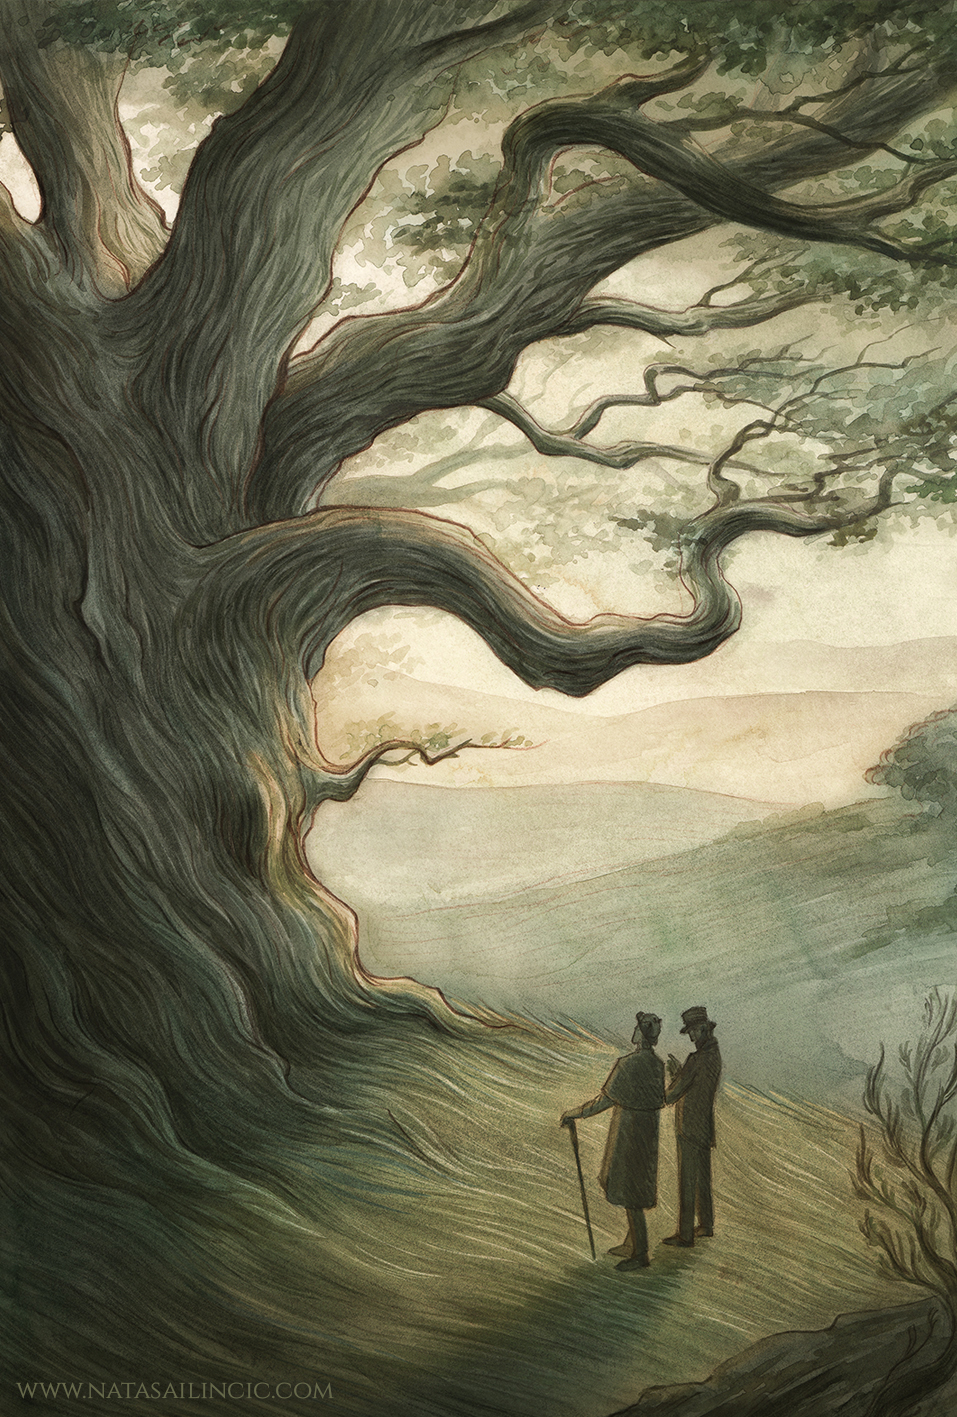 Sherlock Holmes - a patriarch among oaks by NatasaIlincic